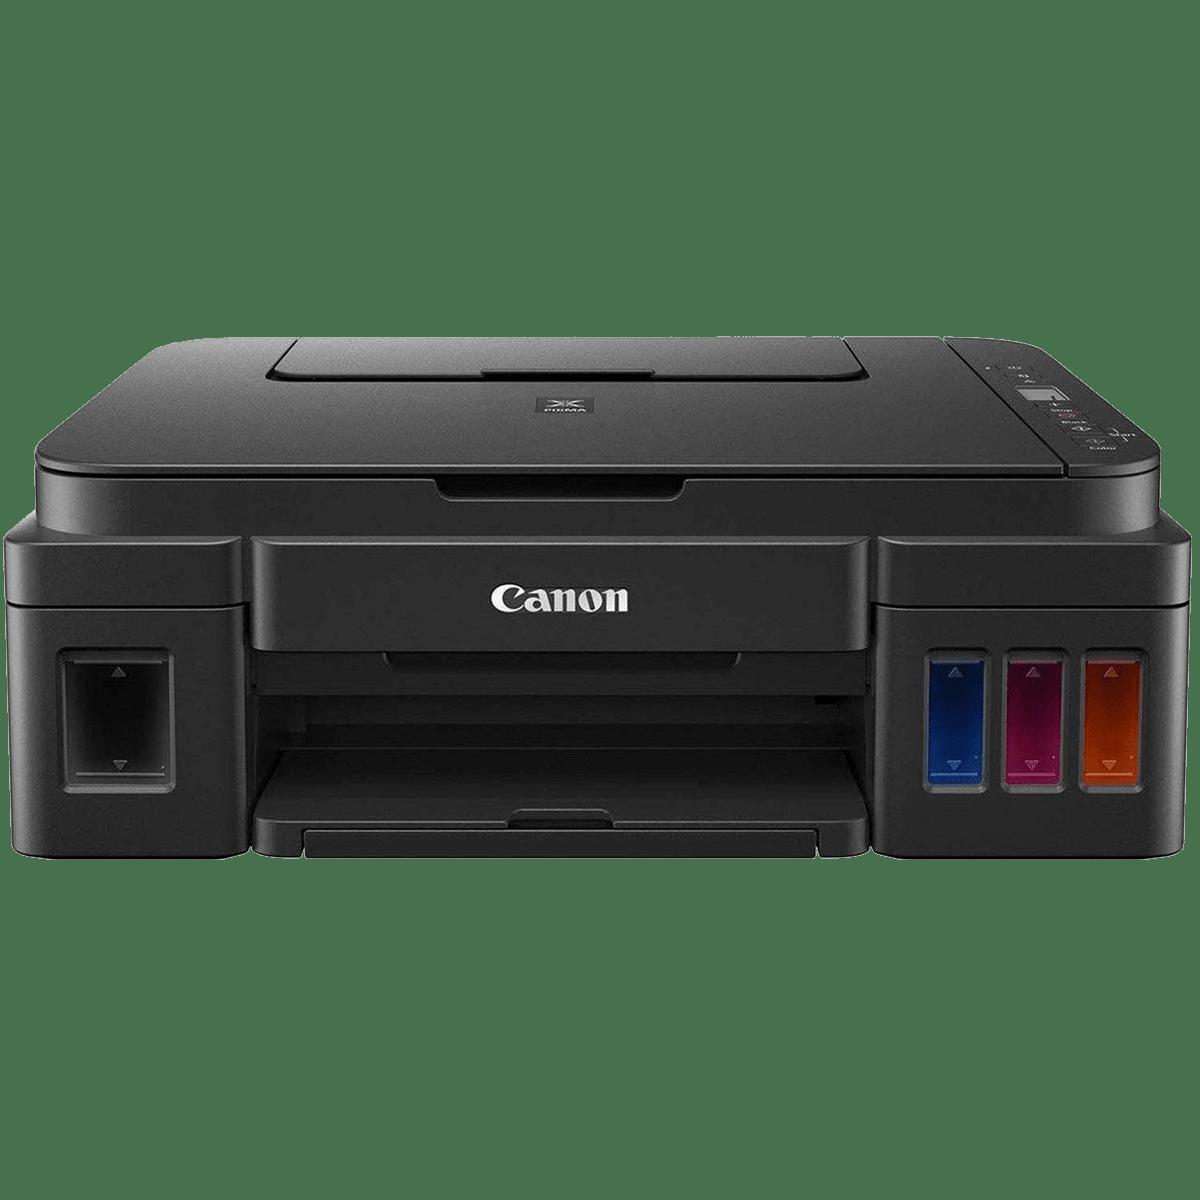 Canon Pixma All-in-One Ink Tank Printer (G2010, Black)